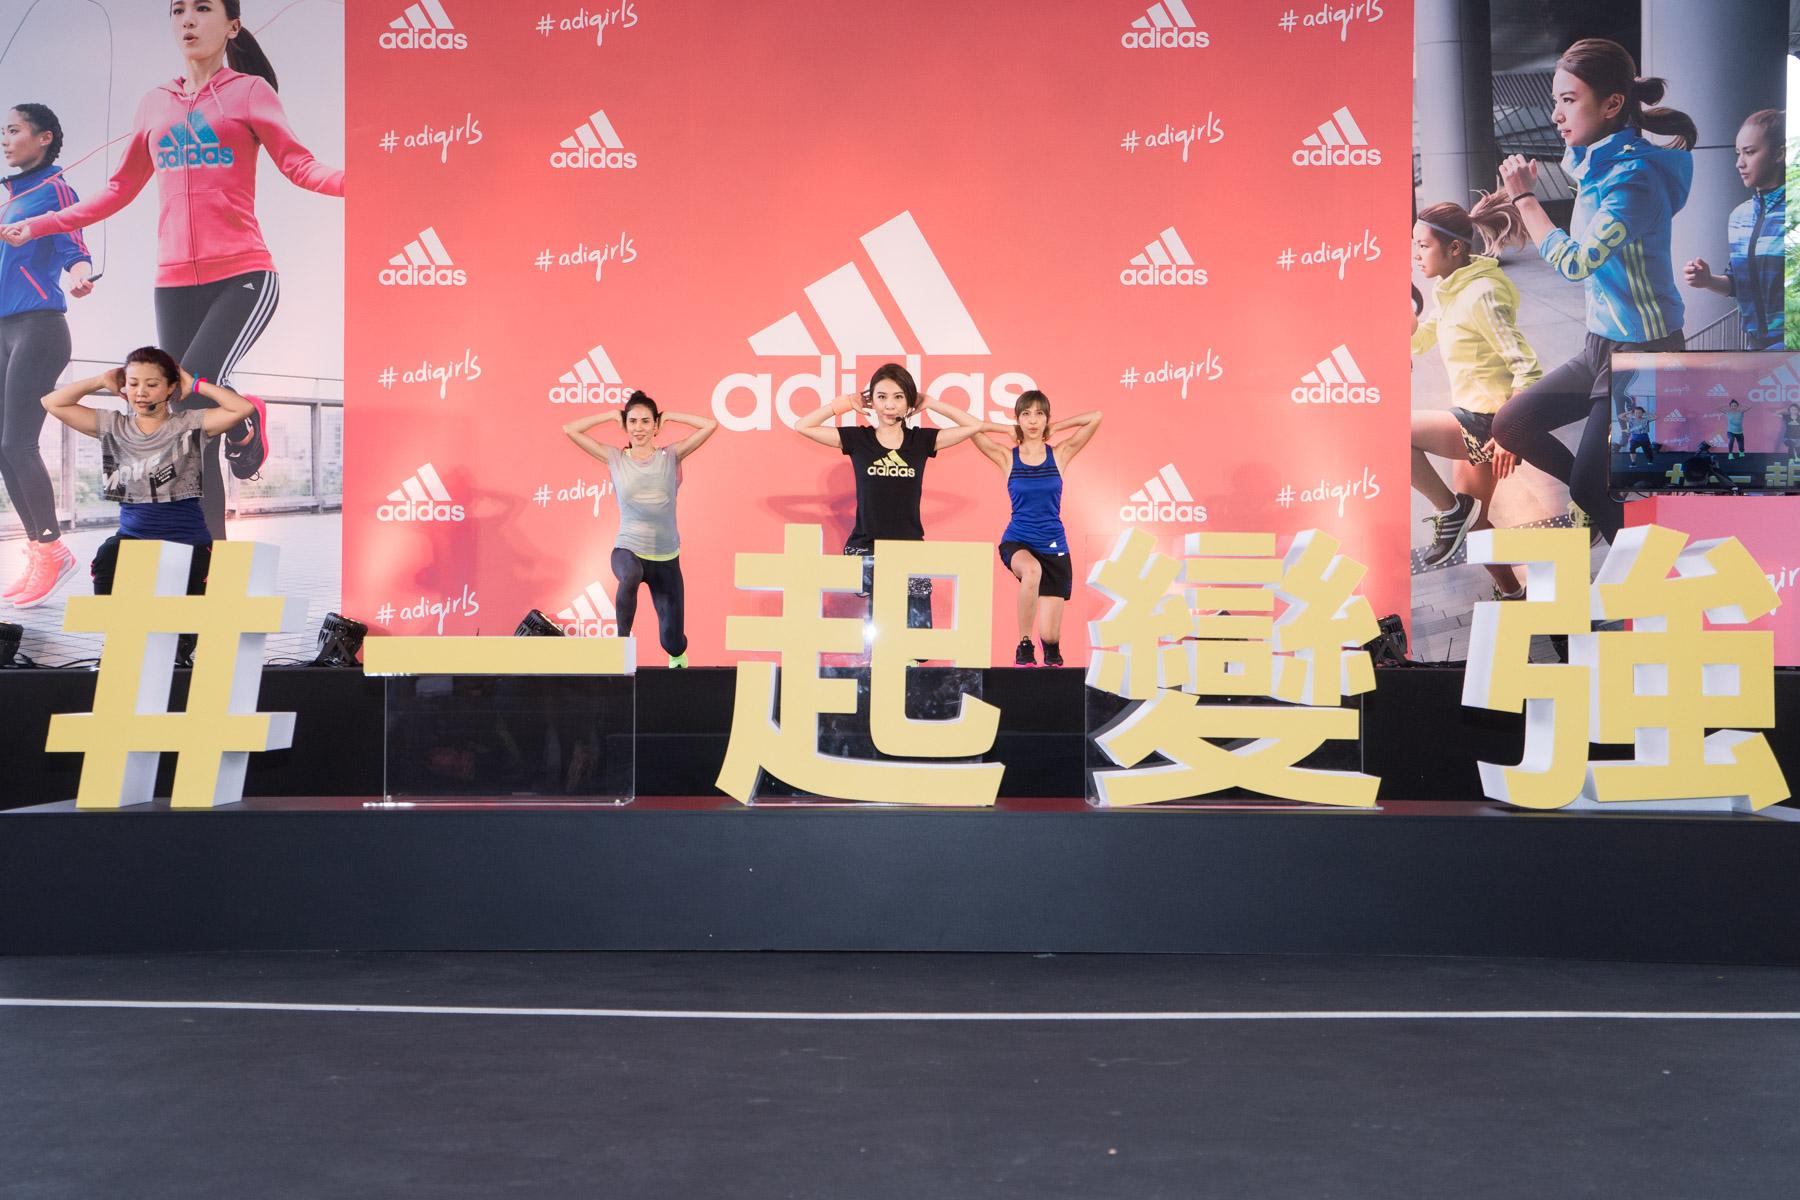 adidas-adigirls press conference 20150924-7